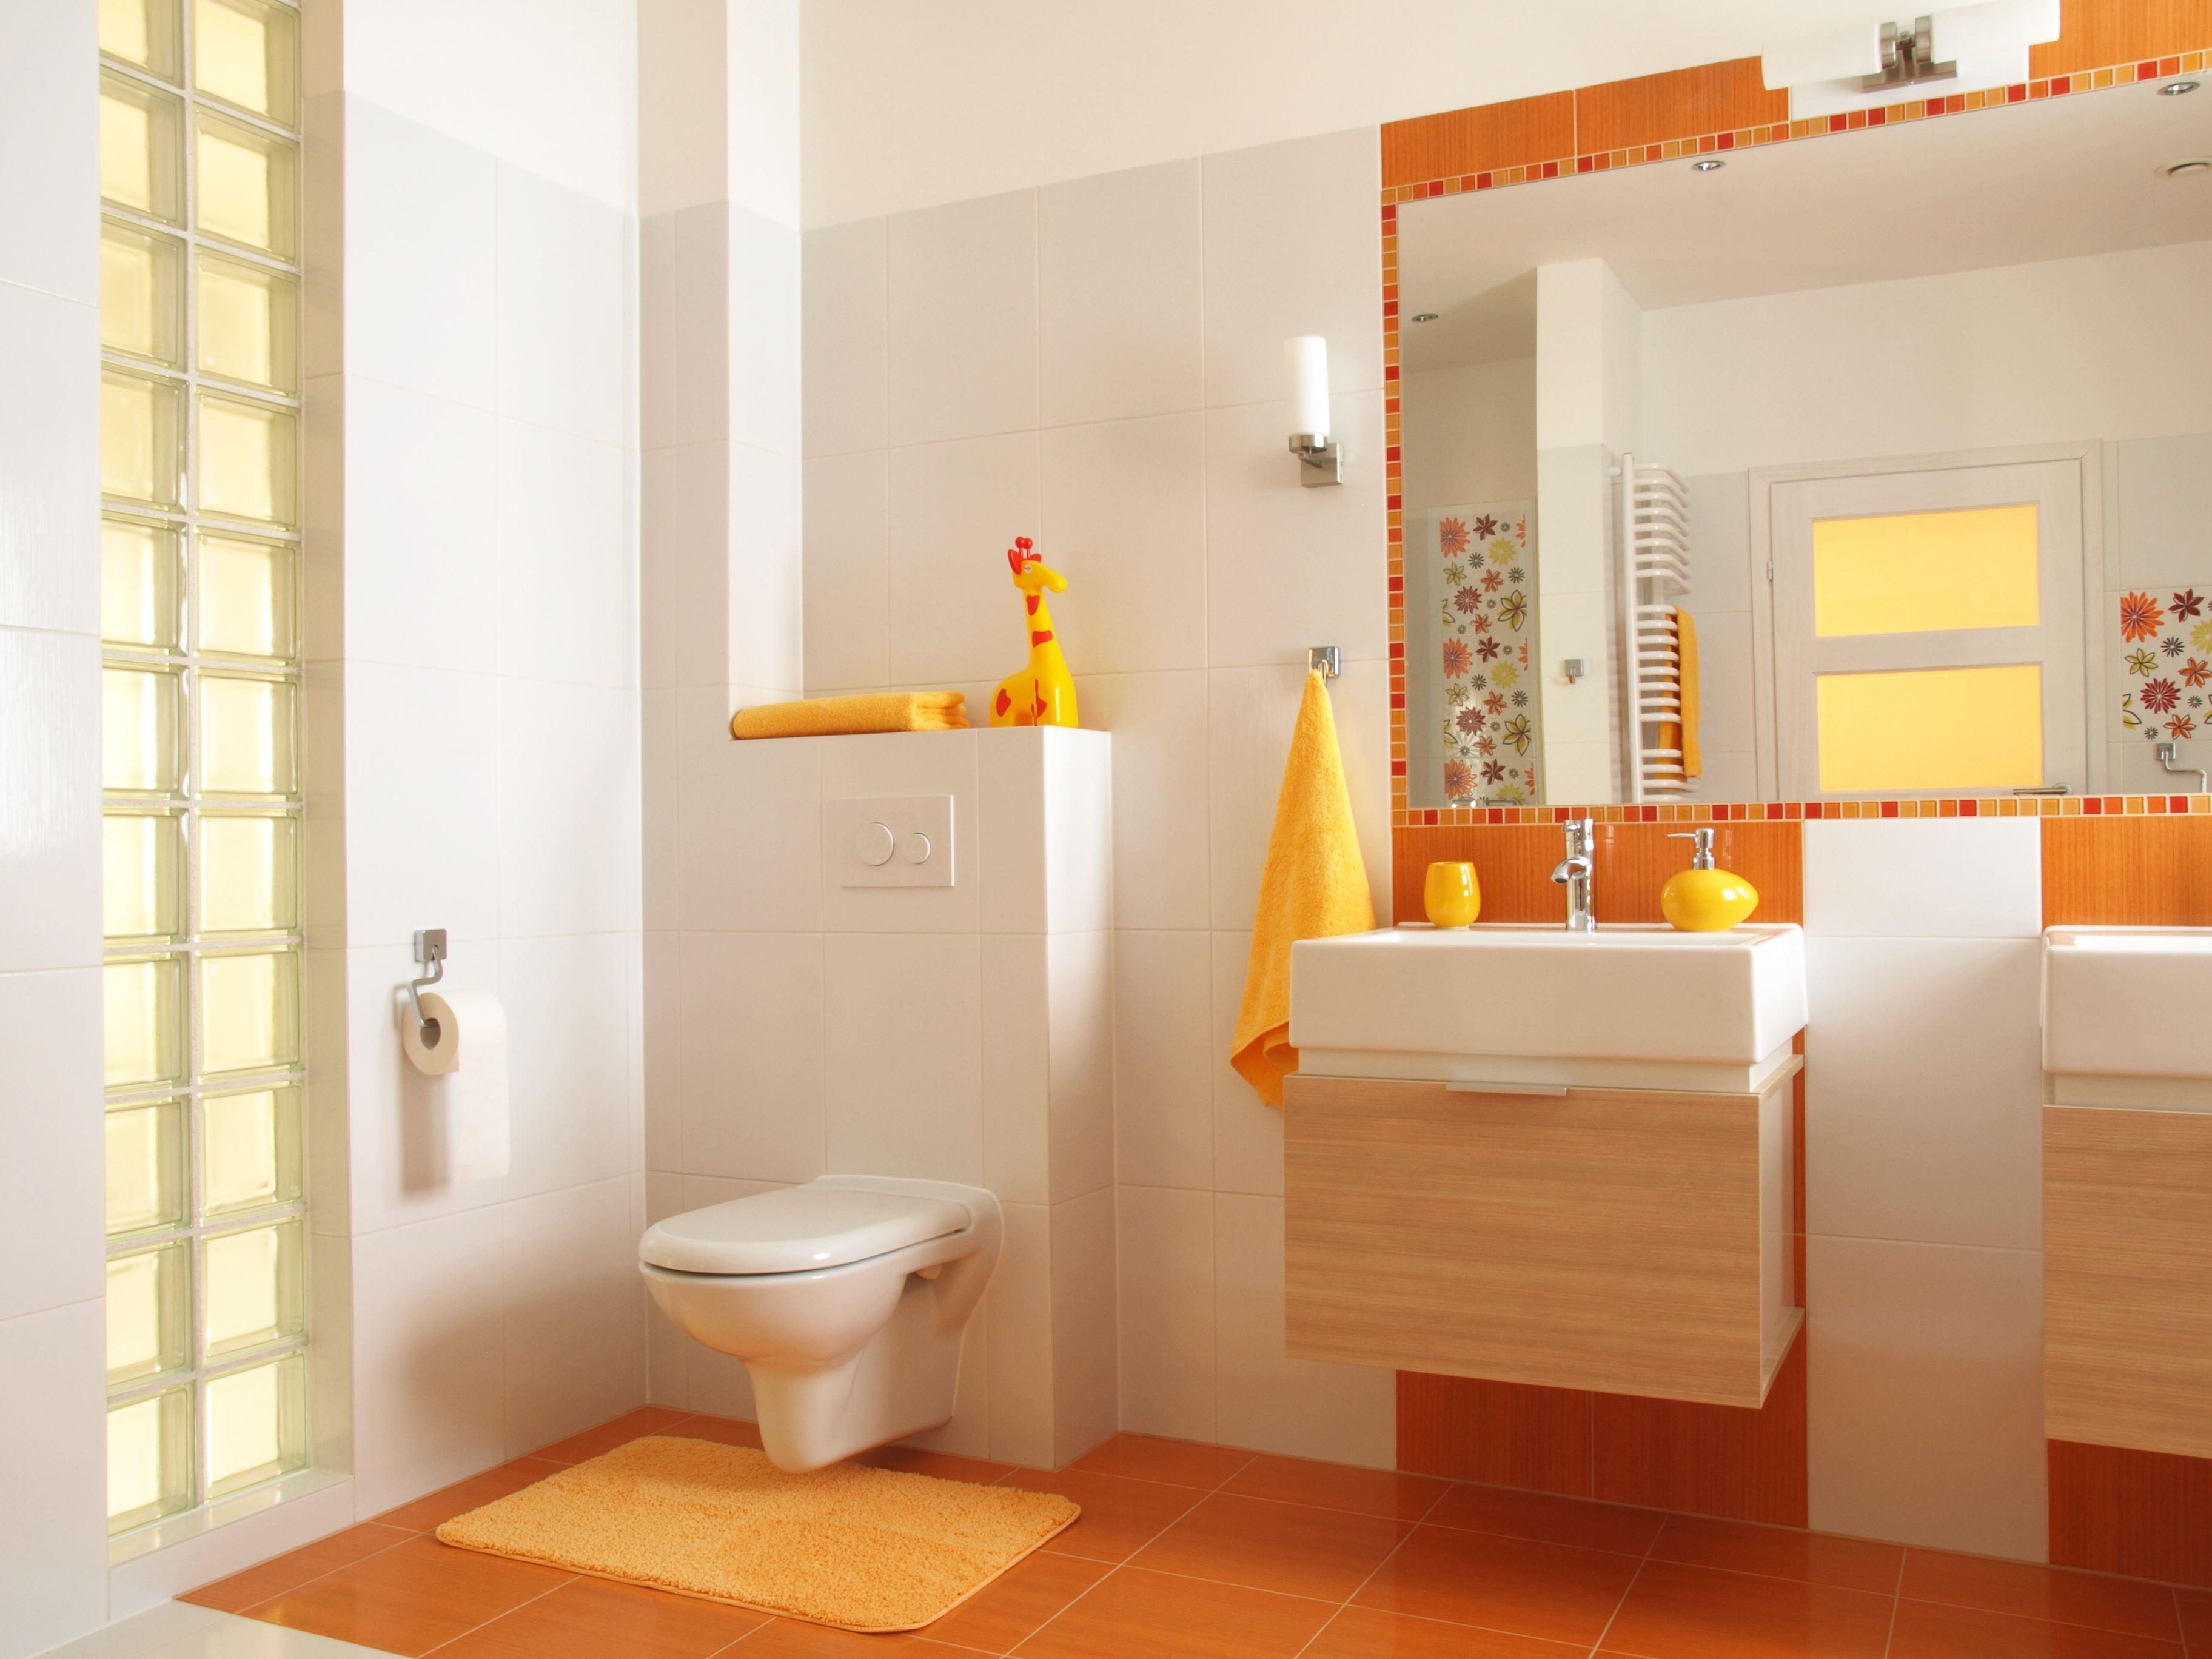 koupelna_koupelnovy_nabytek_wc